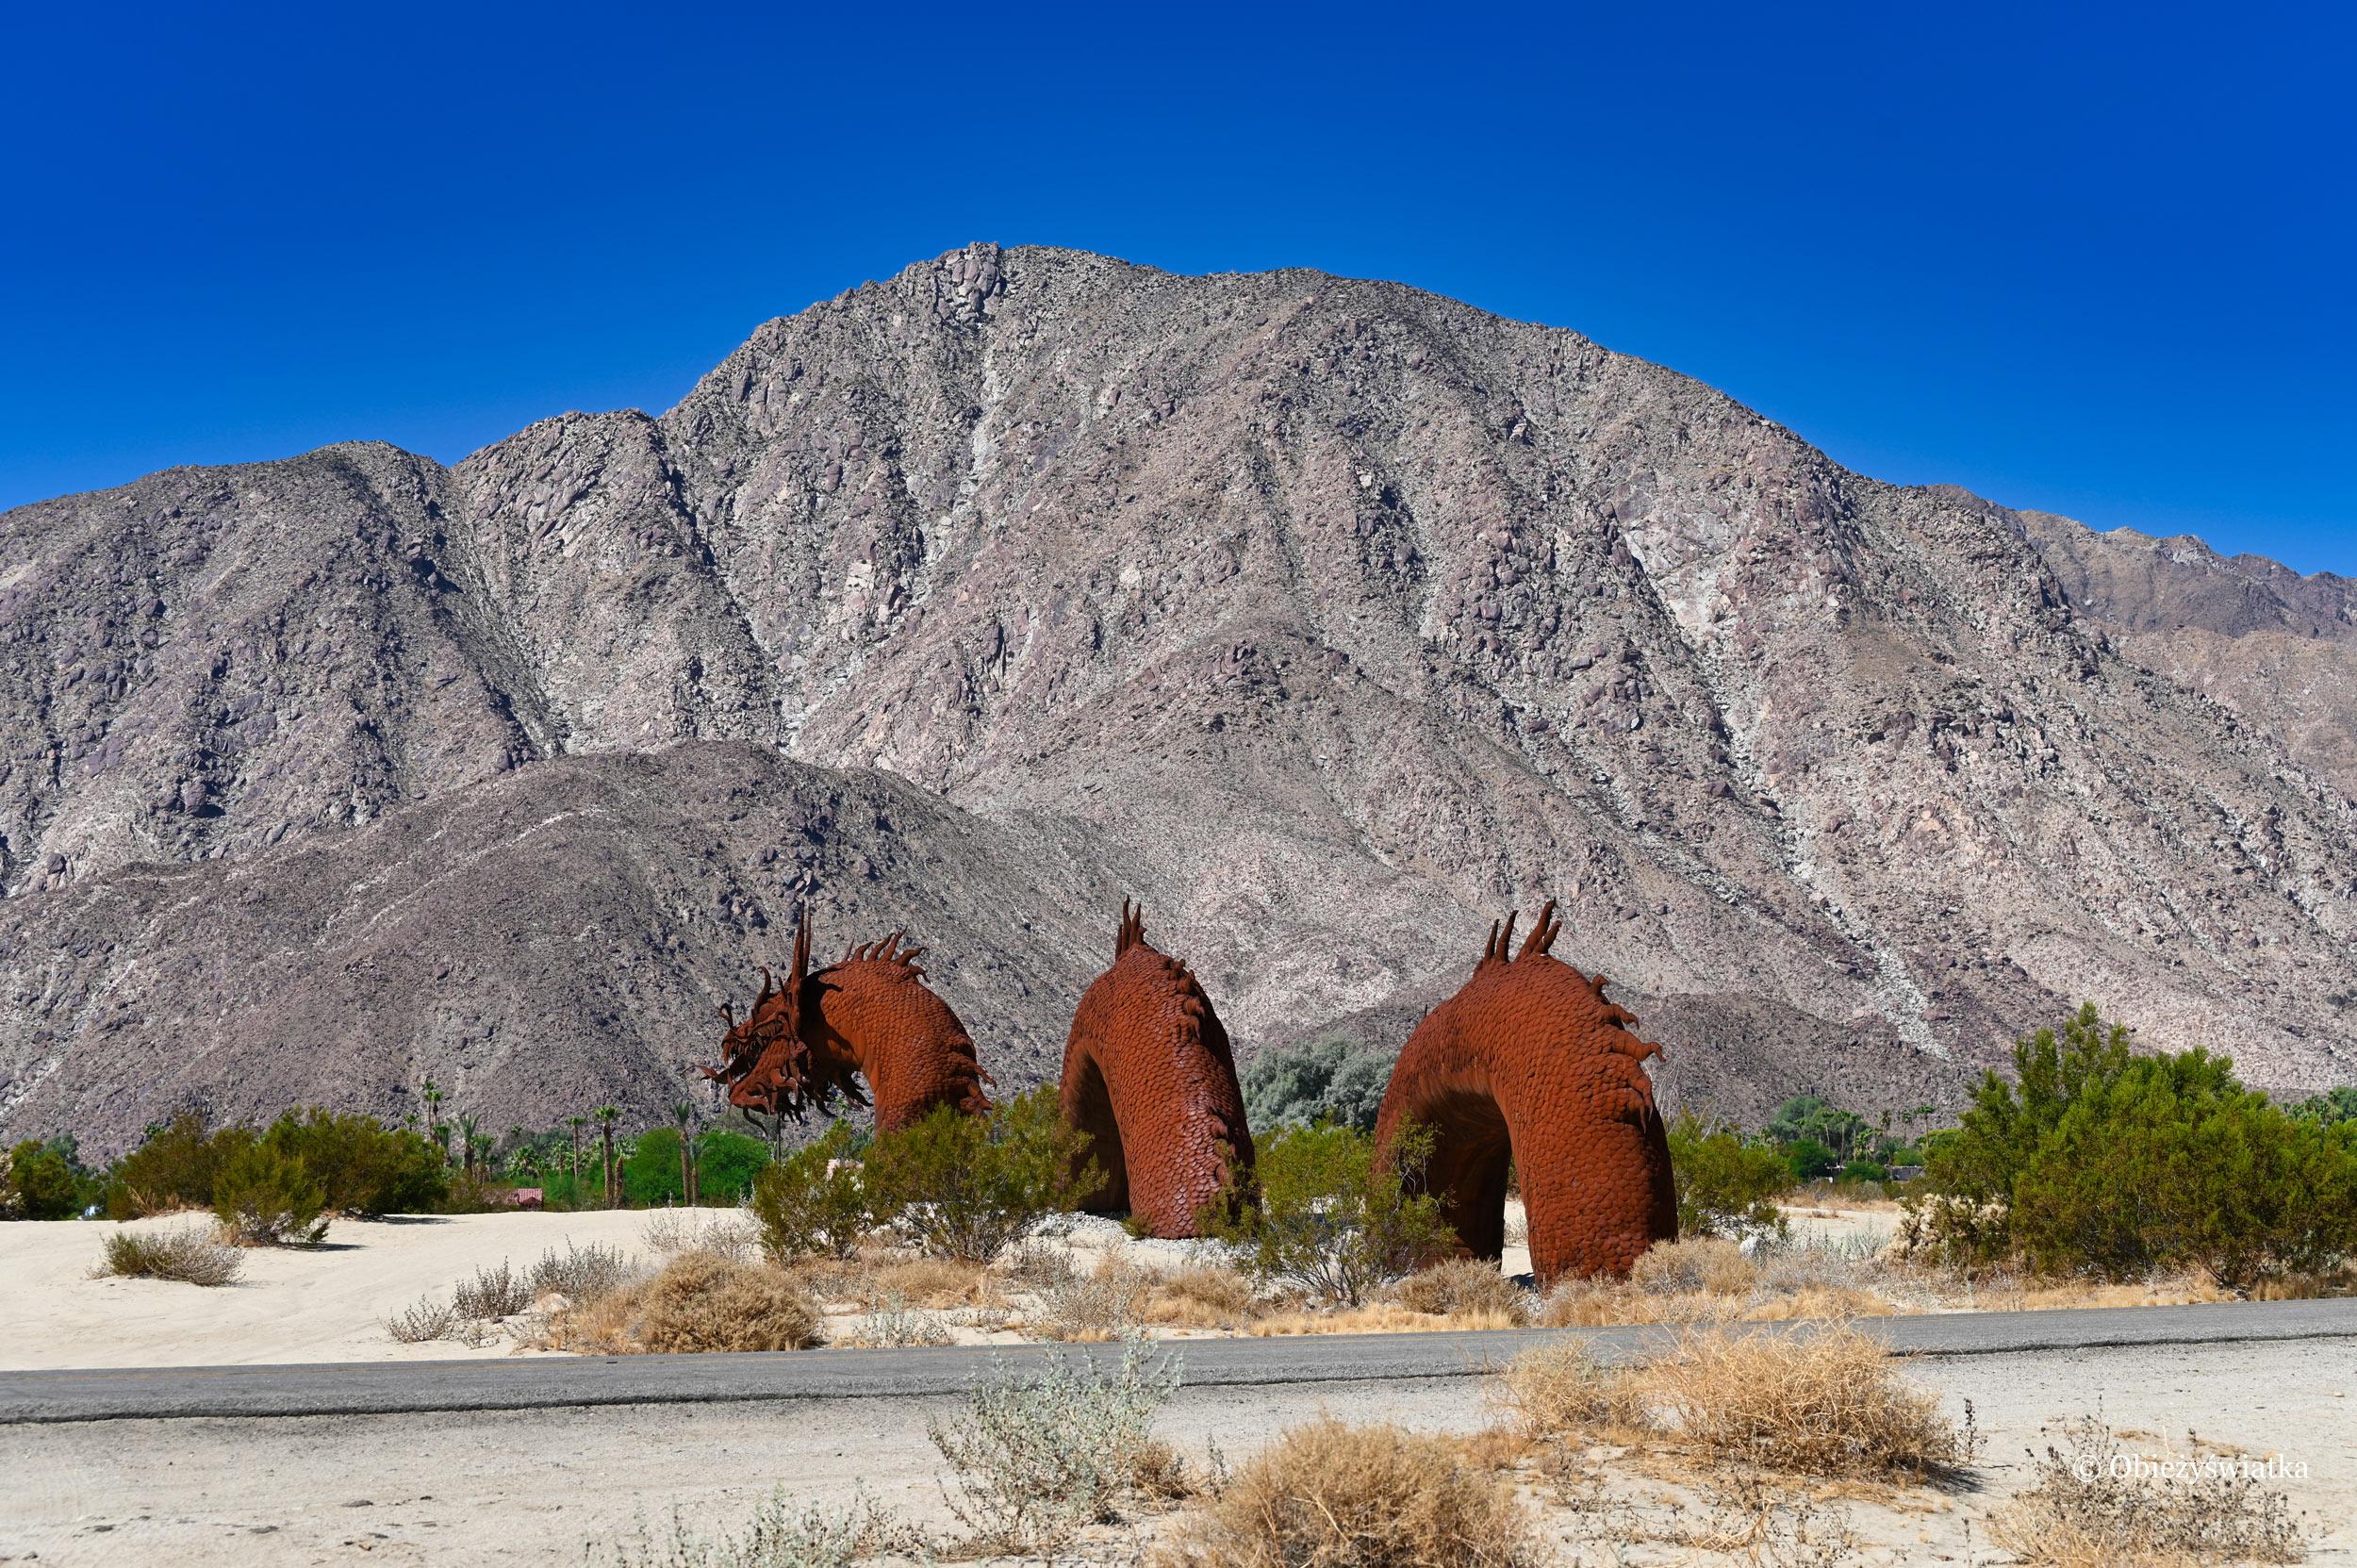 Smok - rzeźba w Borrego Springs, Kalifornia